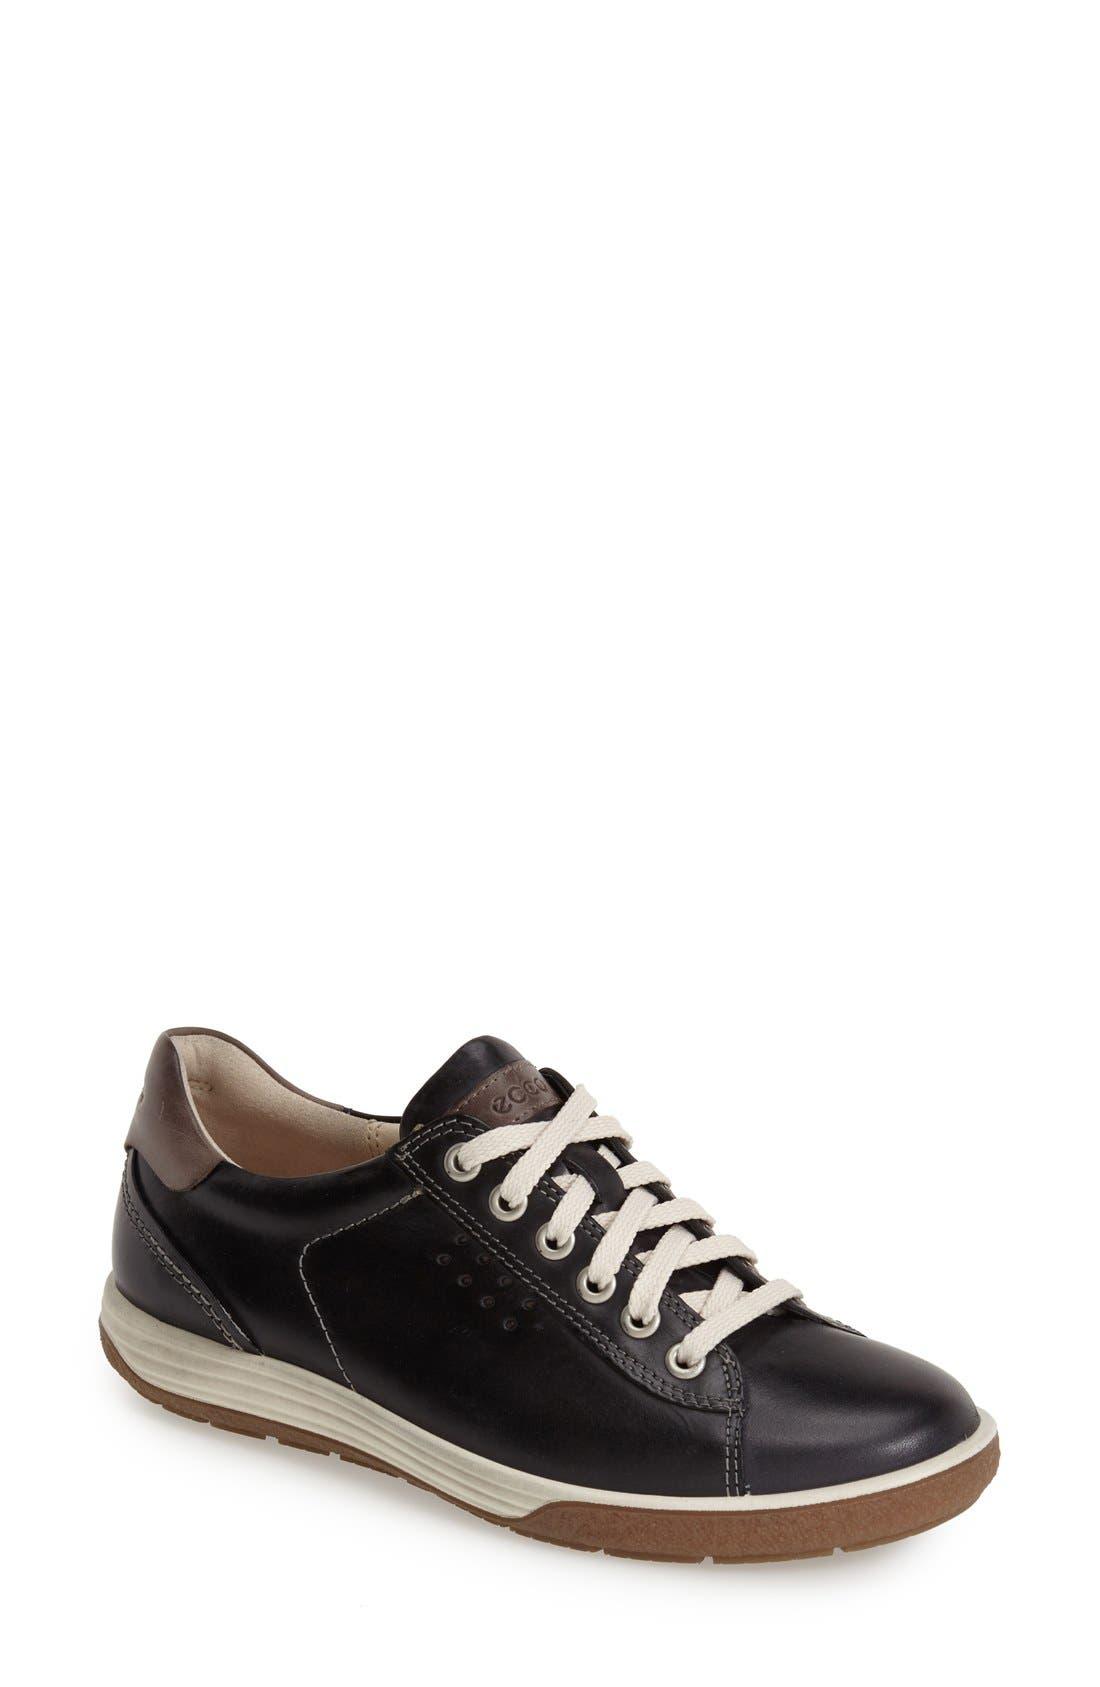 Alternate Image 1 Selected - ECCO 'Chase II' Sneaker (Women)